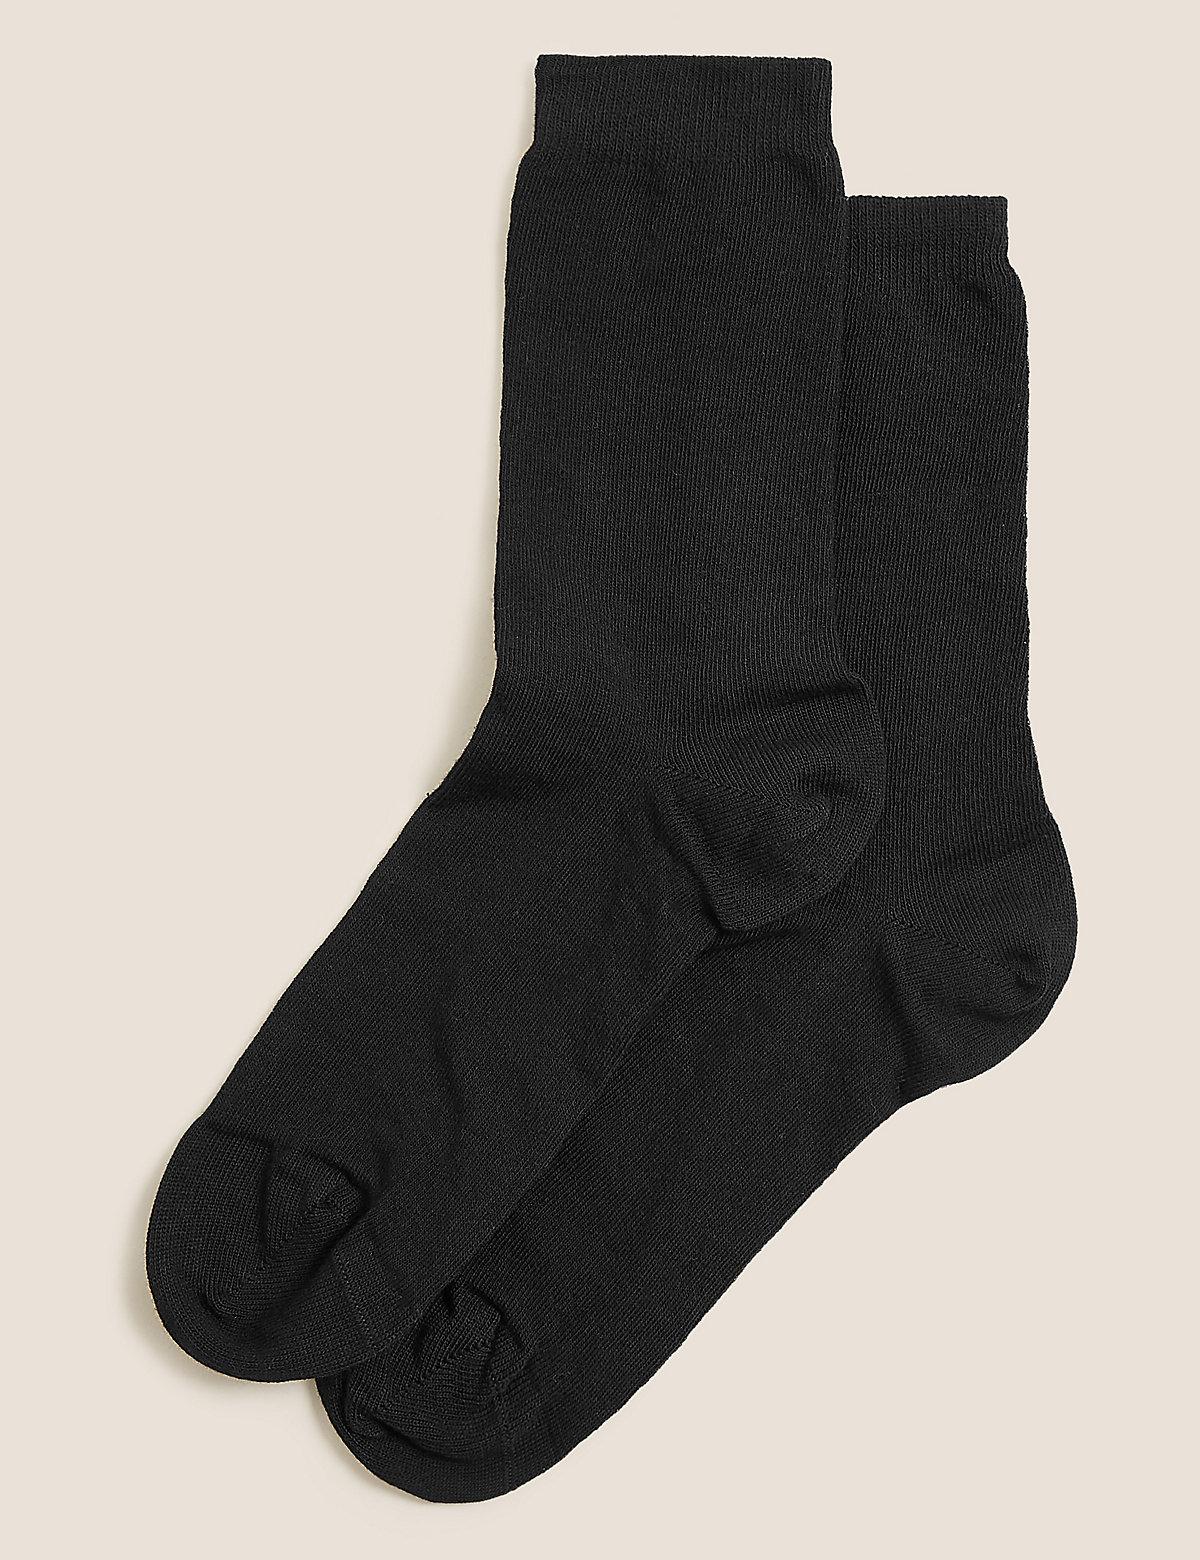 Autograph 2 Pack Blister Resist Ankle High Socks